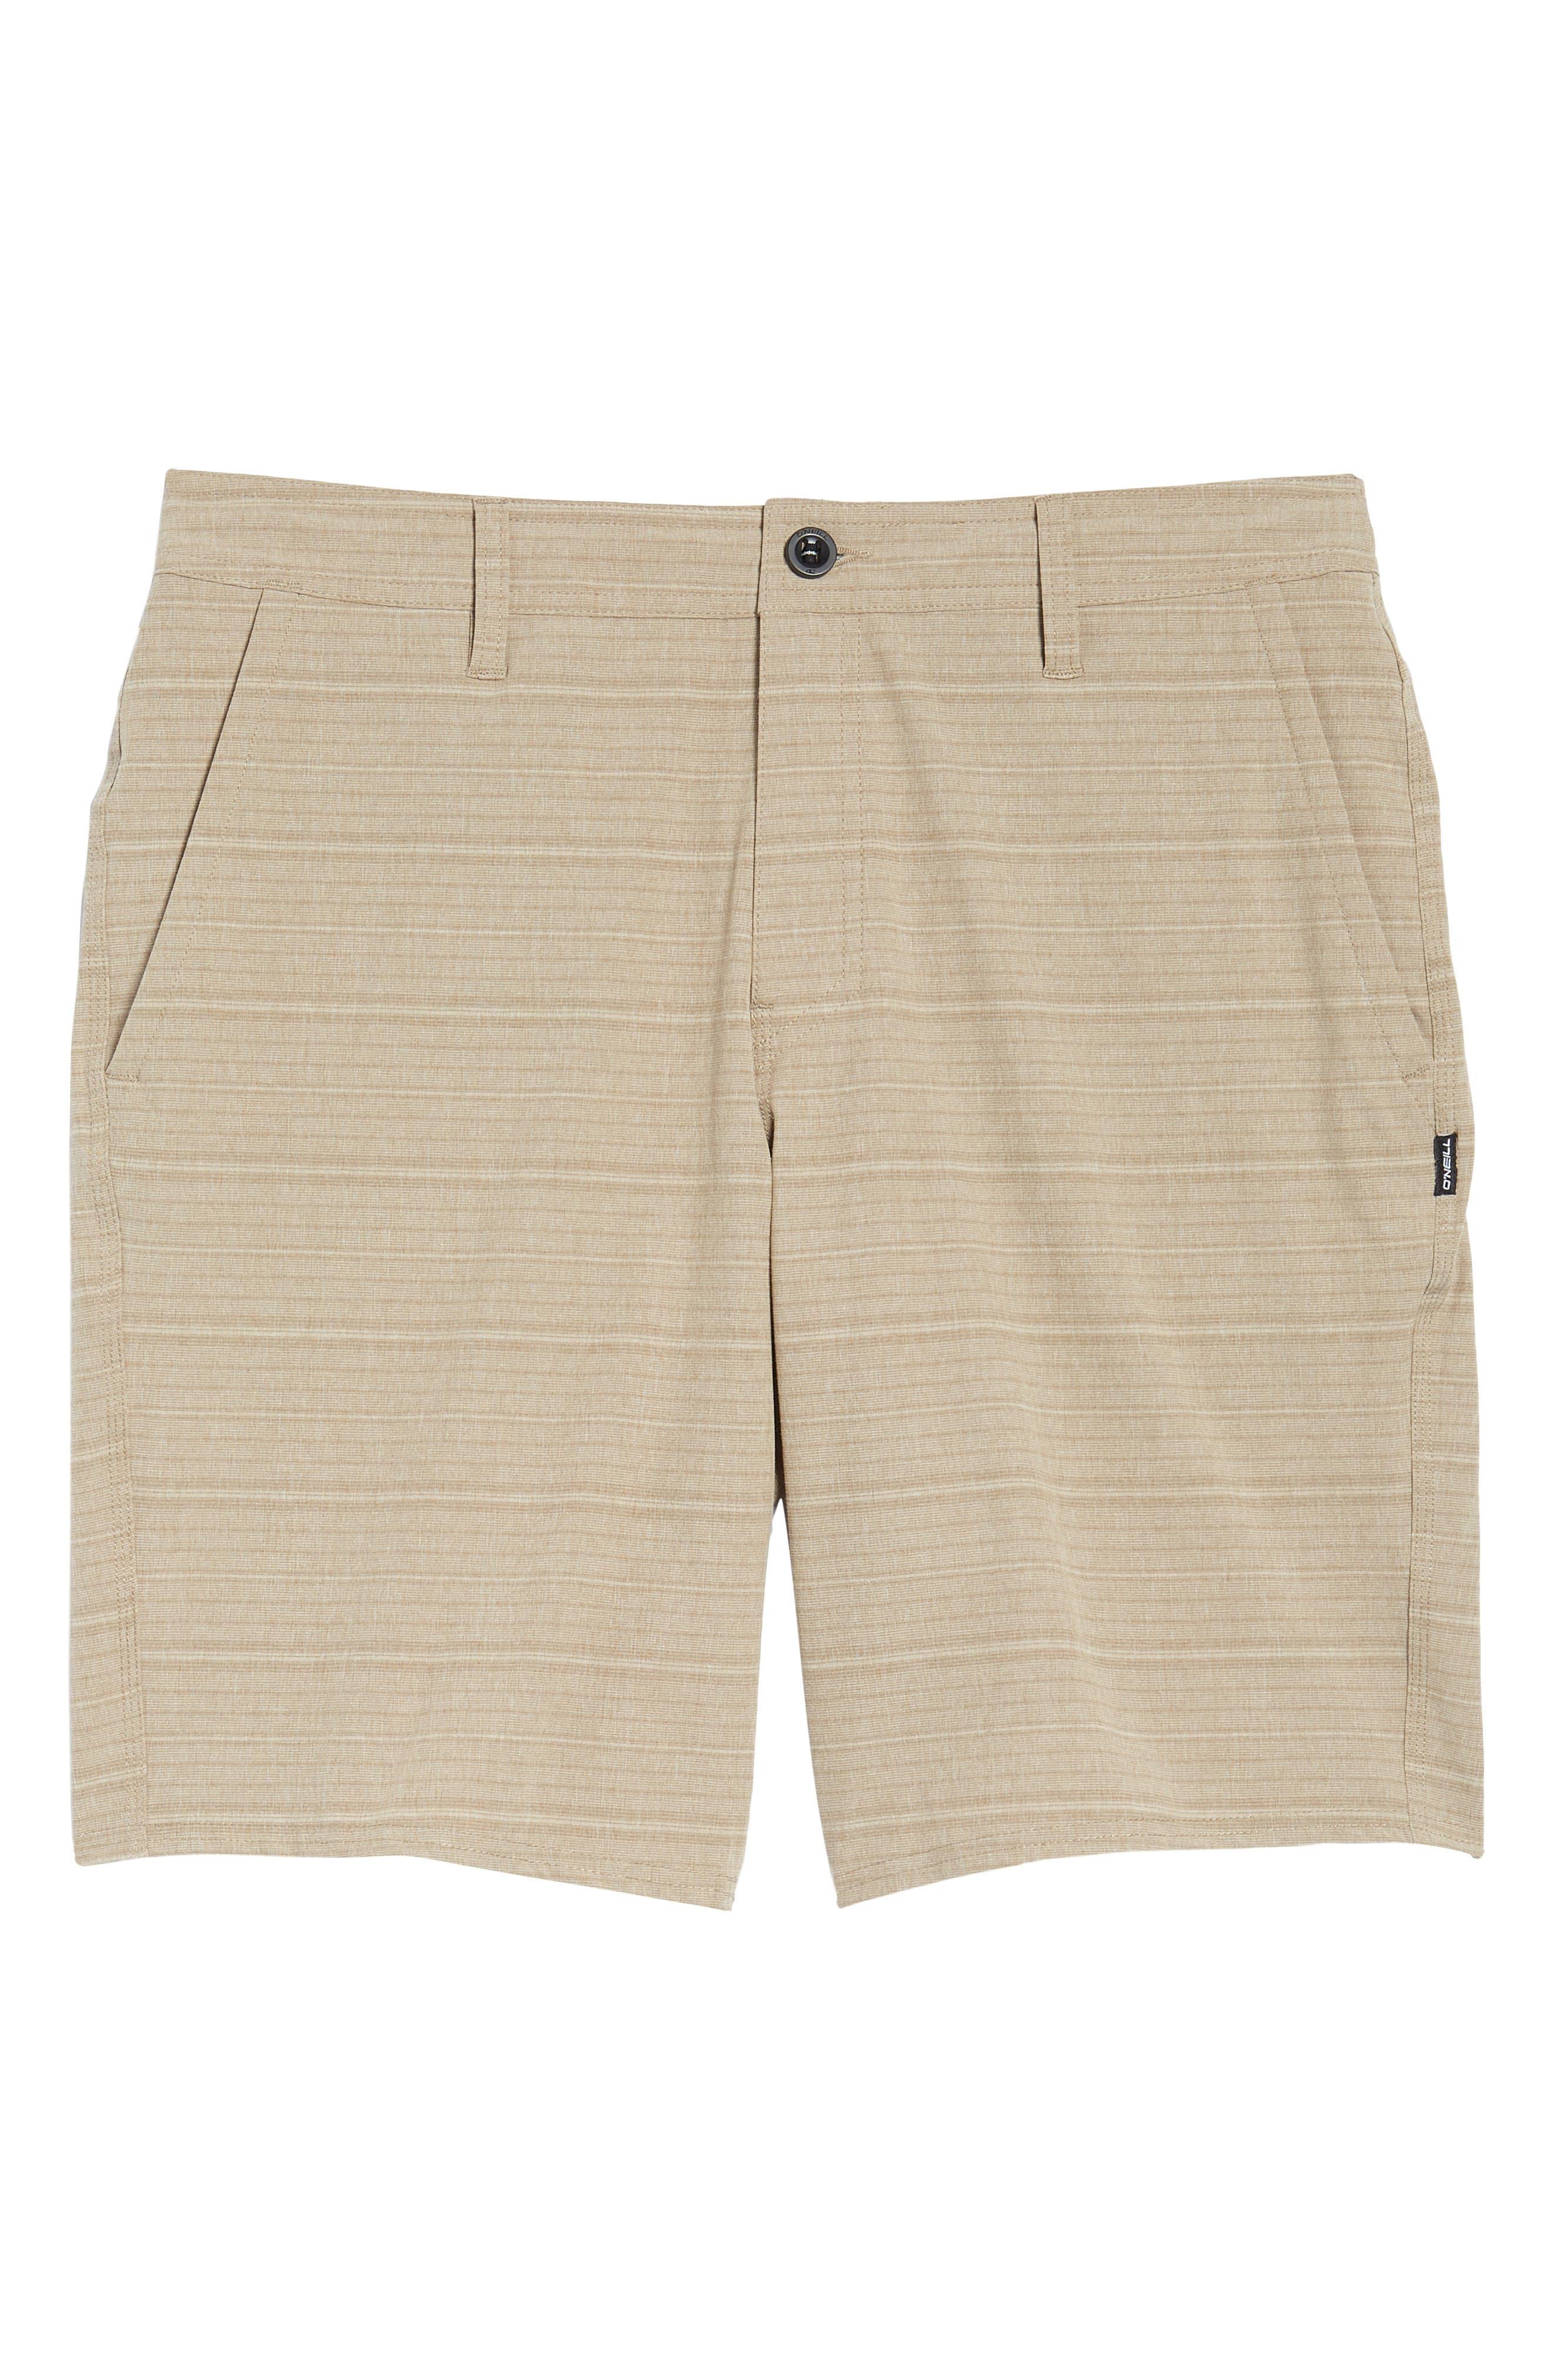 Locked Stripe Hybrid Shorts,                             Alternate thumbnail 6, color,                             Khaki